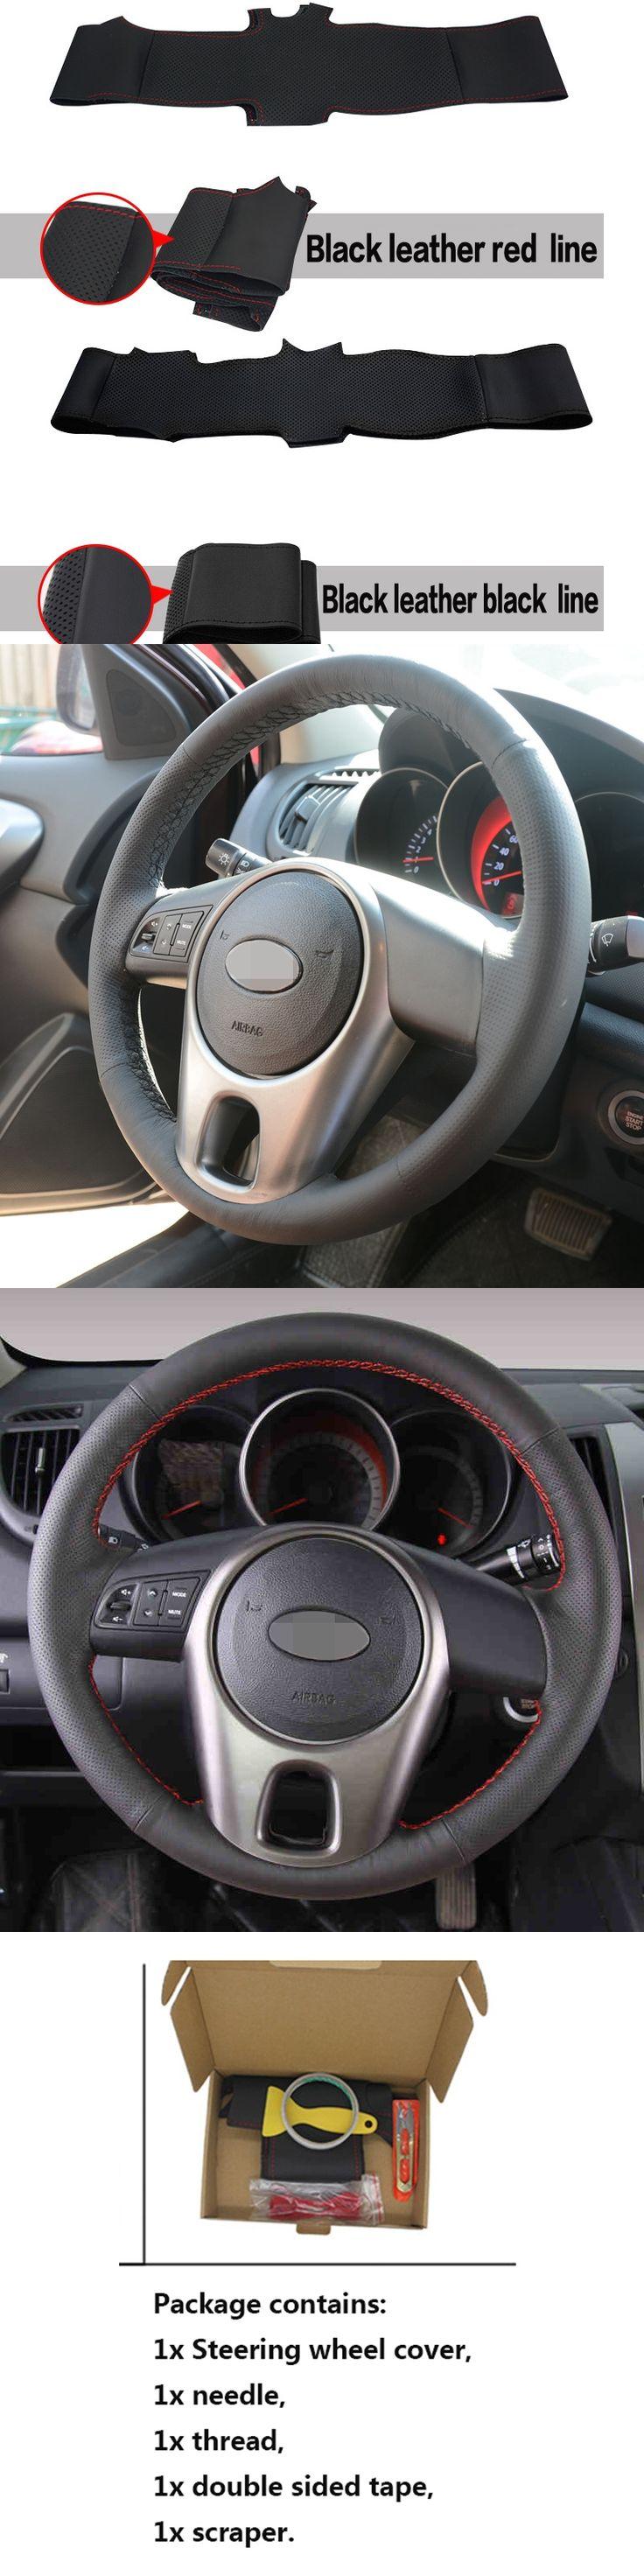 Hand-stitched Black Leather Steering Wheel Cover for Kia Forte Kia Soul Kia Rio 2009-2011